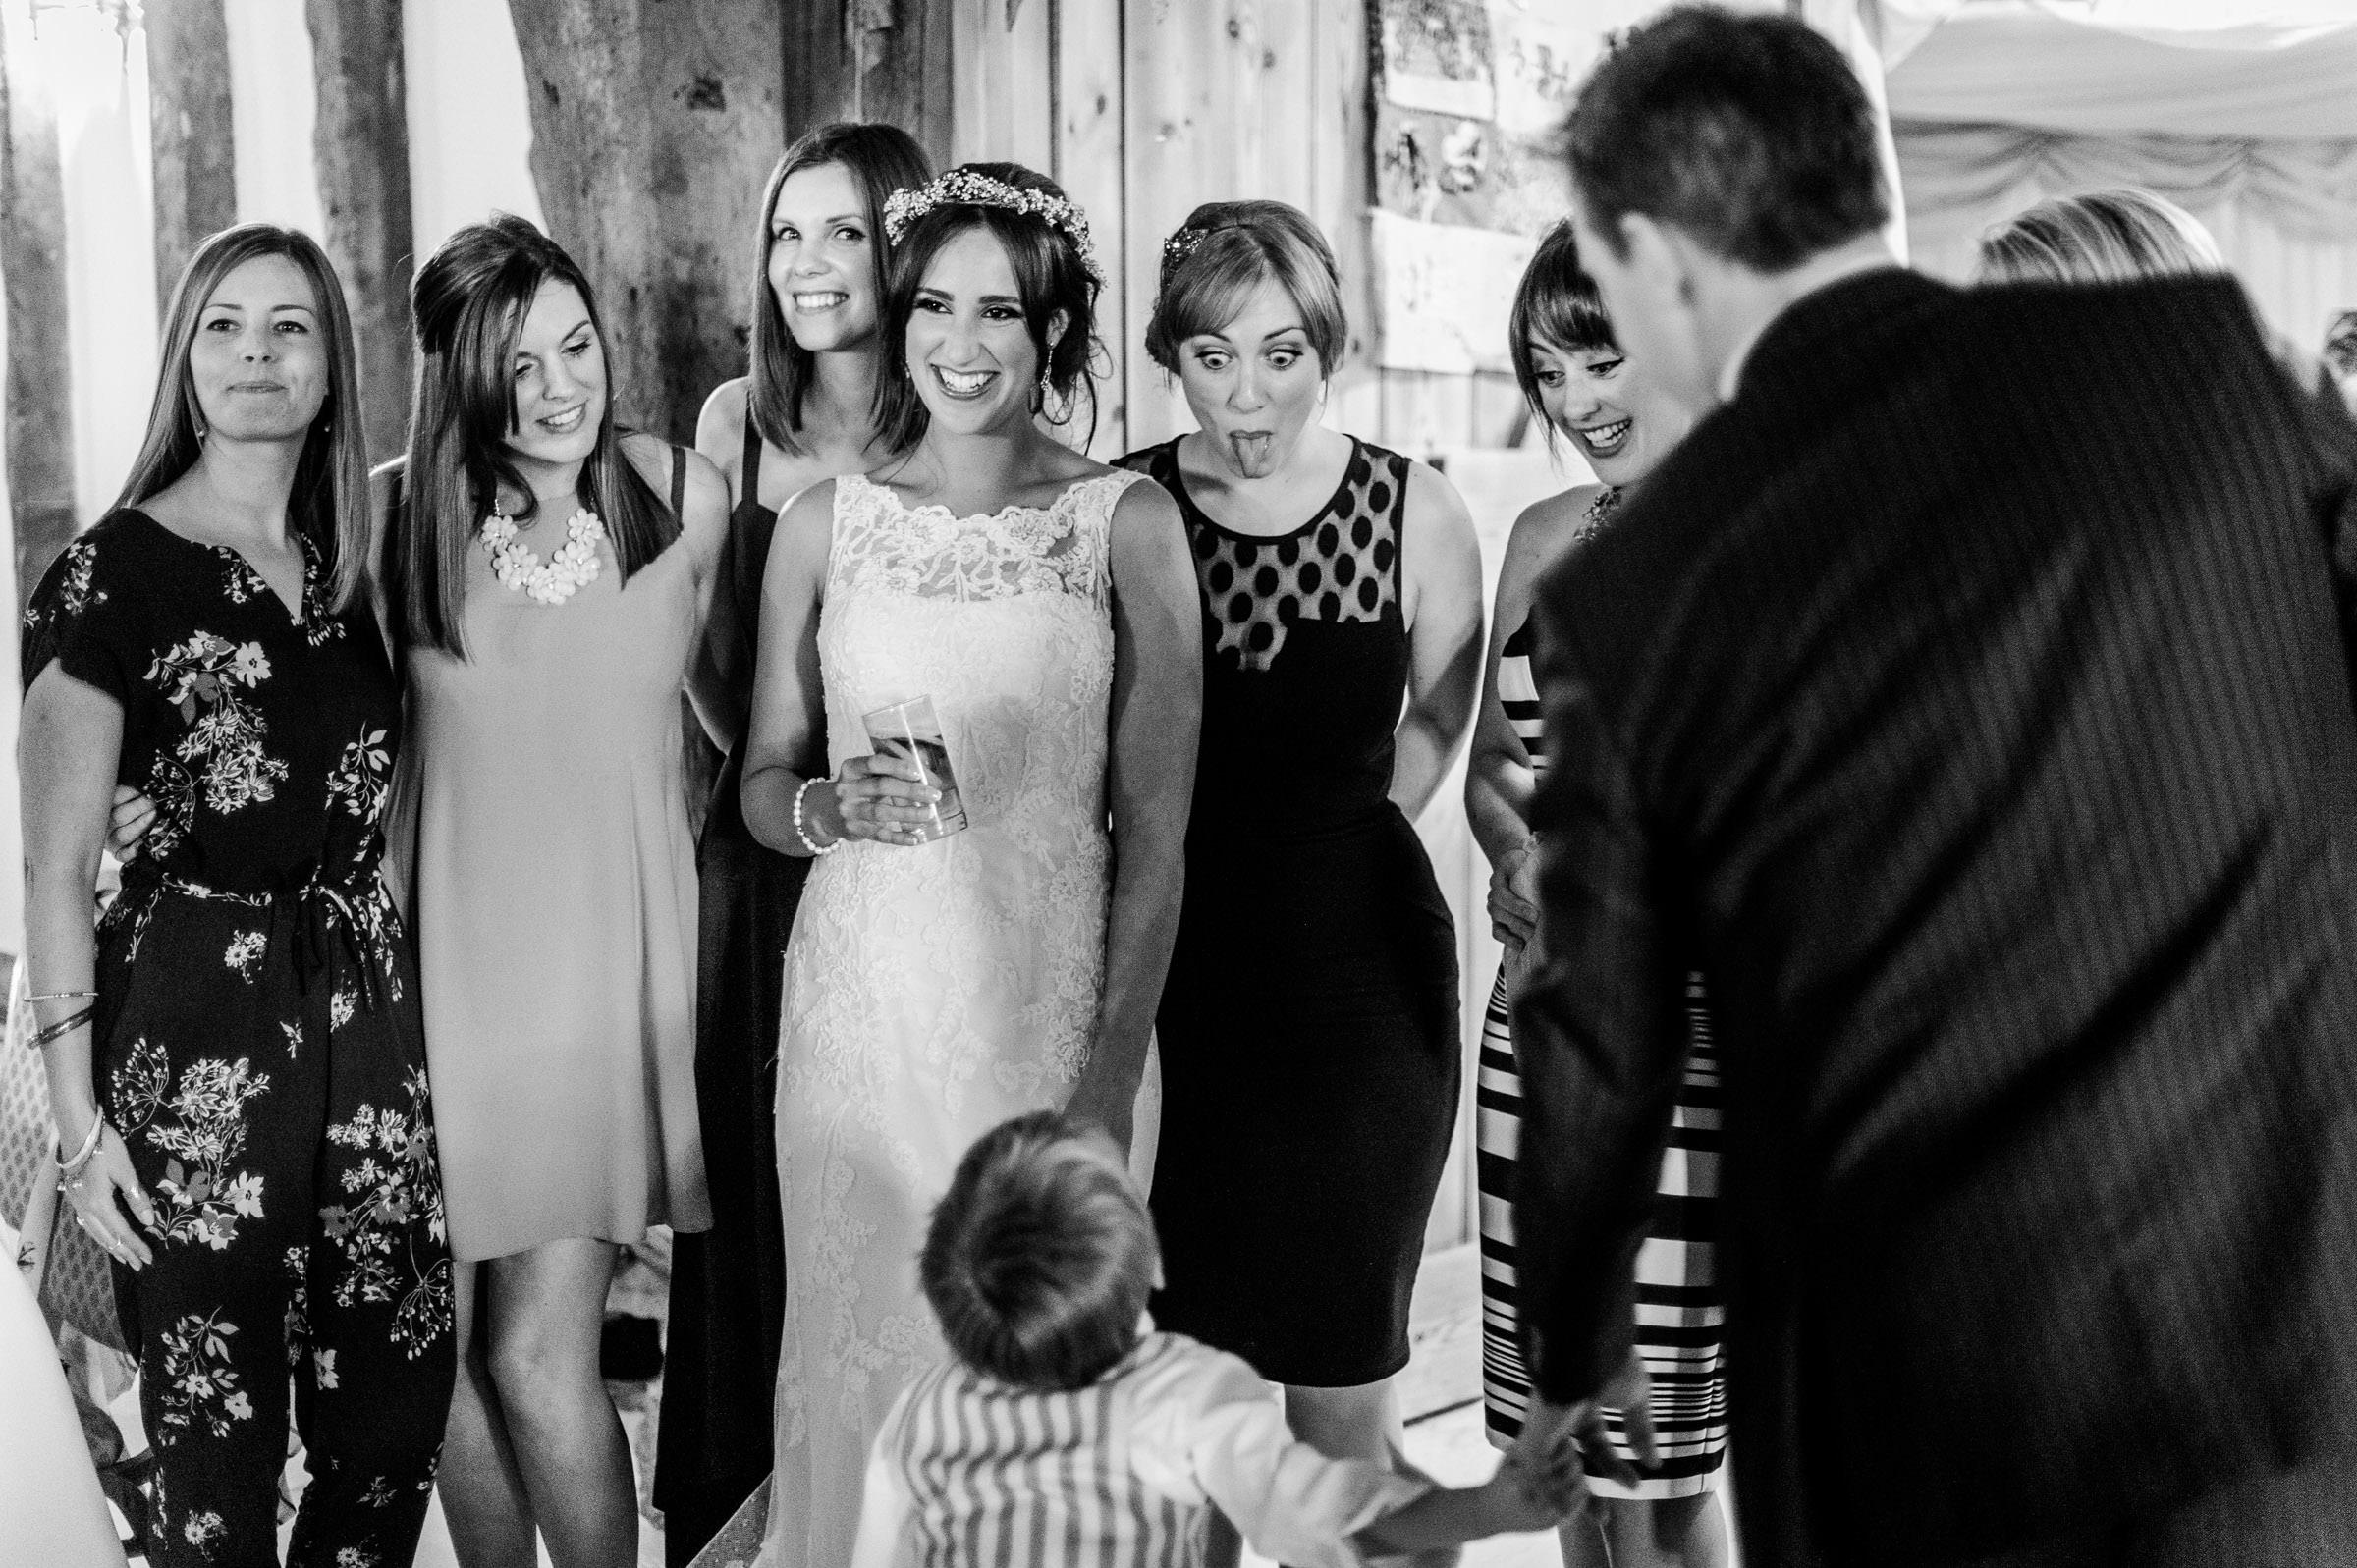 Notley Tythe Barn Reportage Wedding Photos 022.jpg